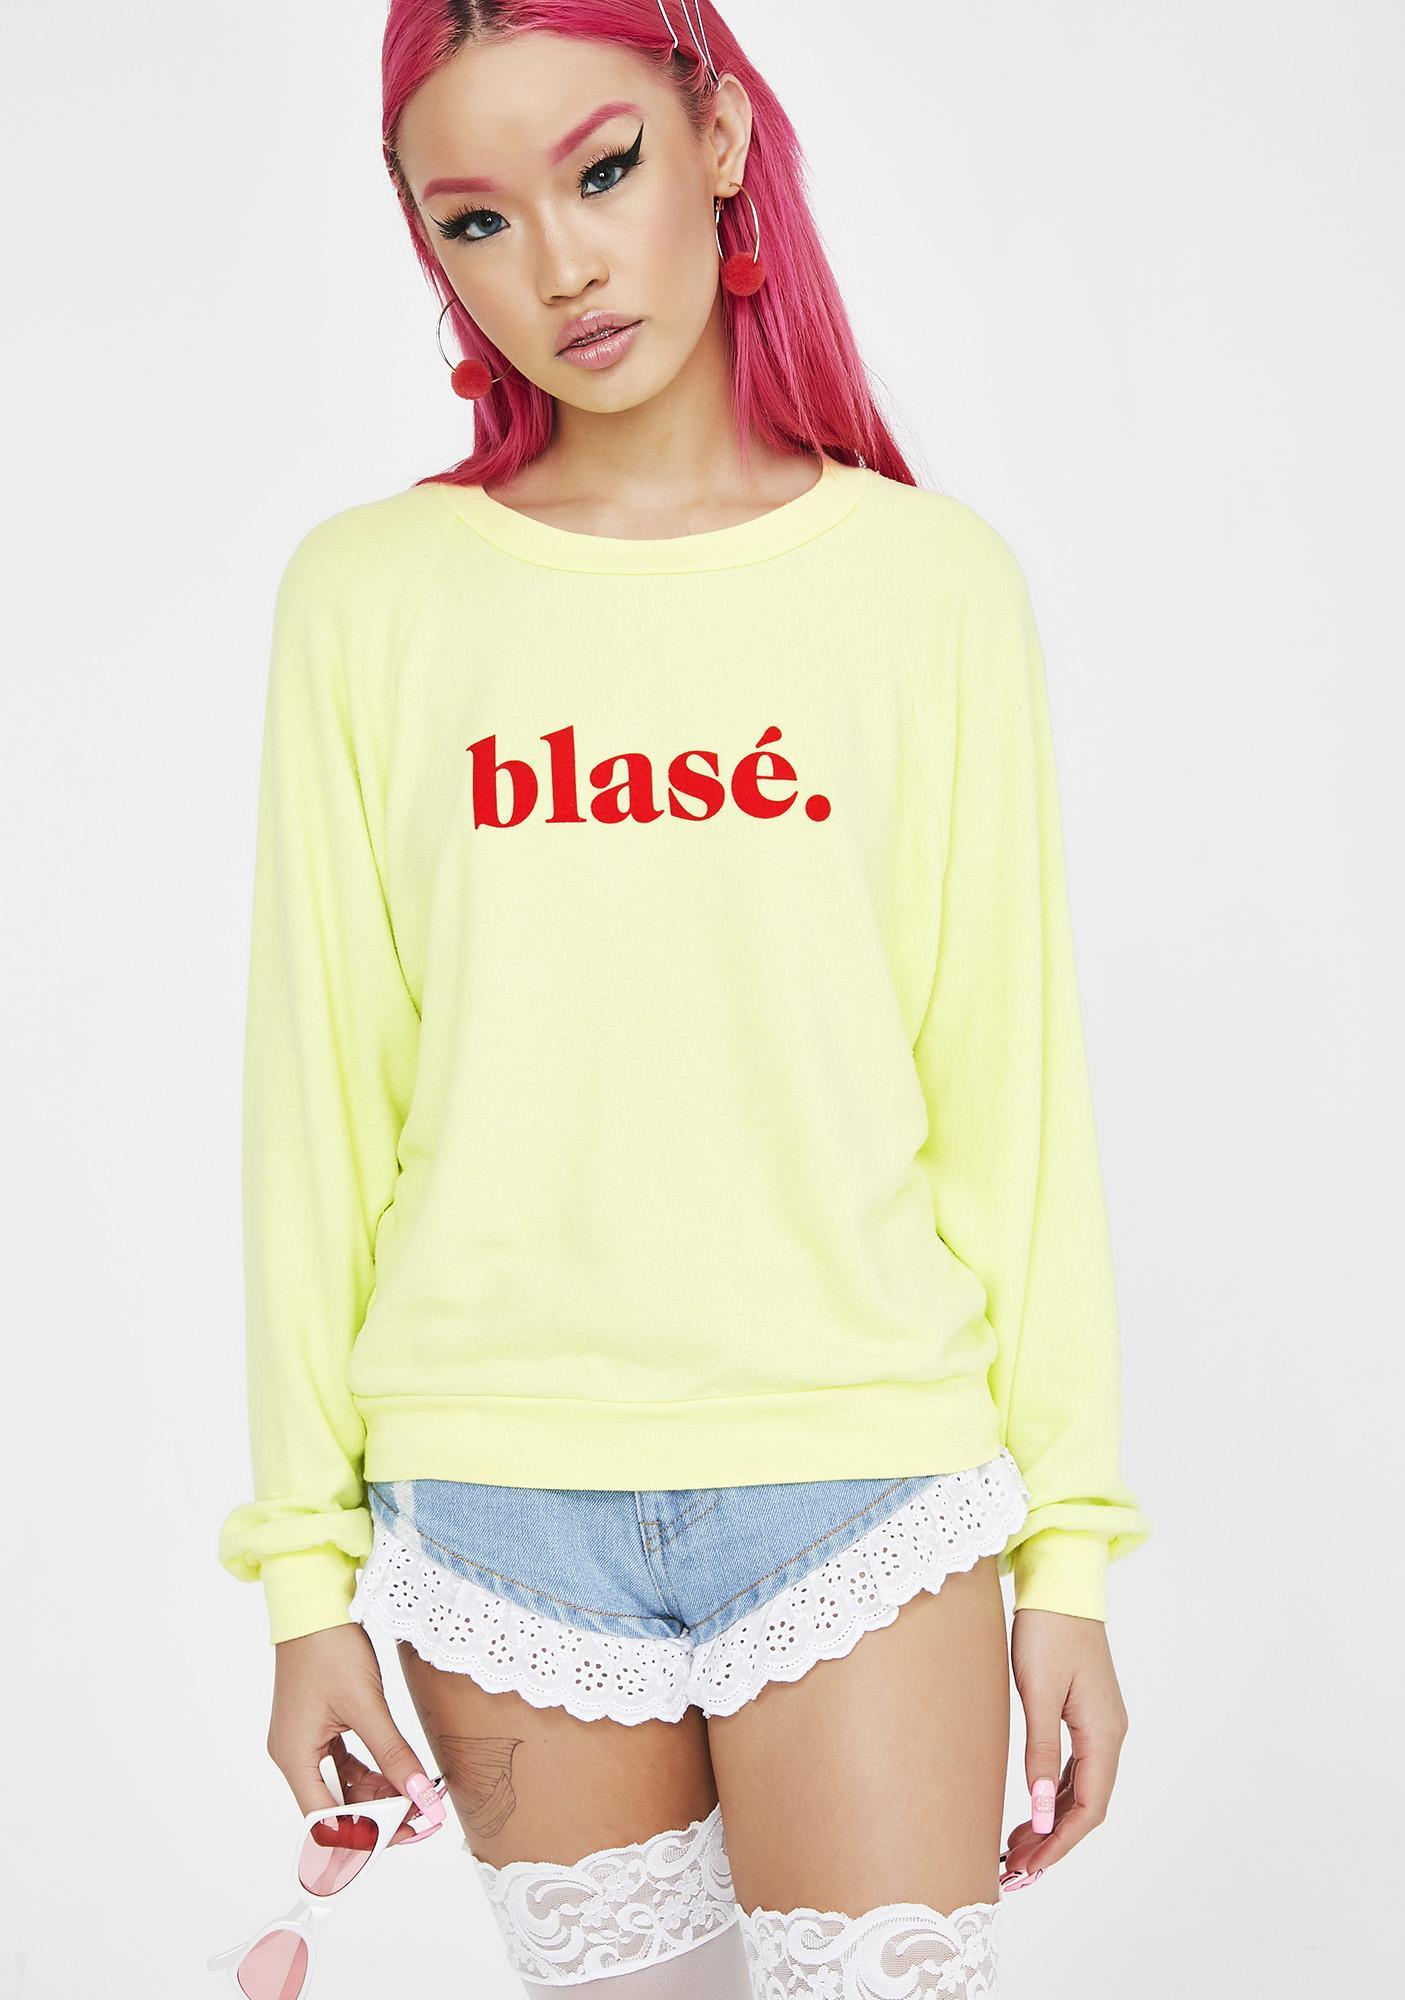 Wildfox Couture Blase Crewneck Sweatshirt